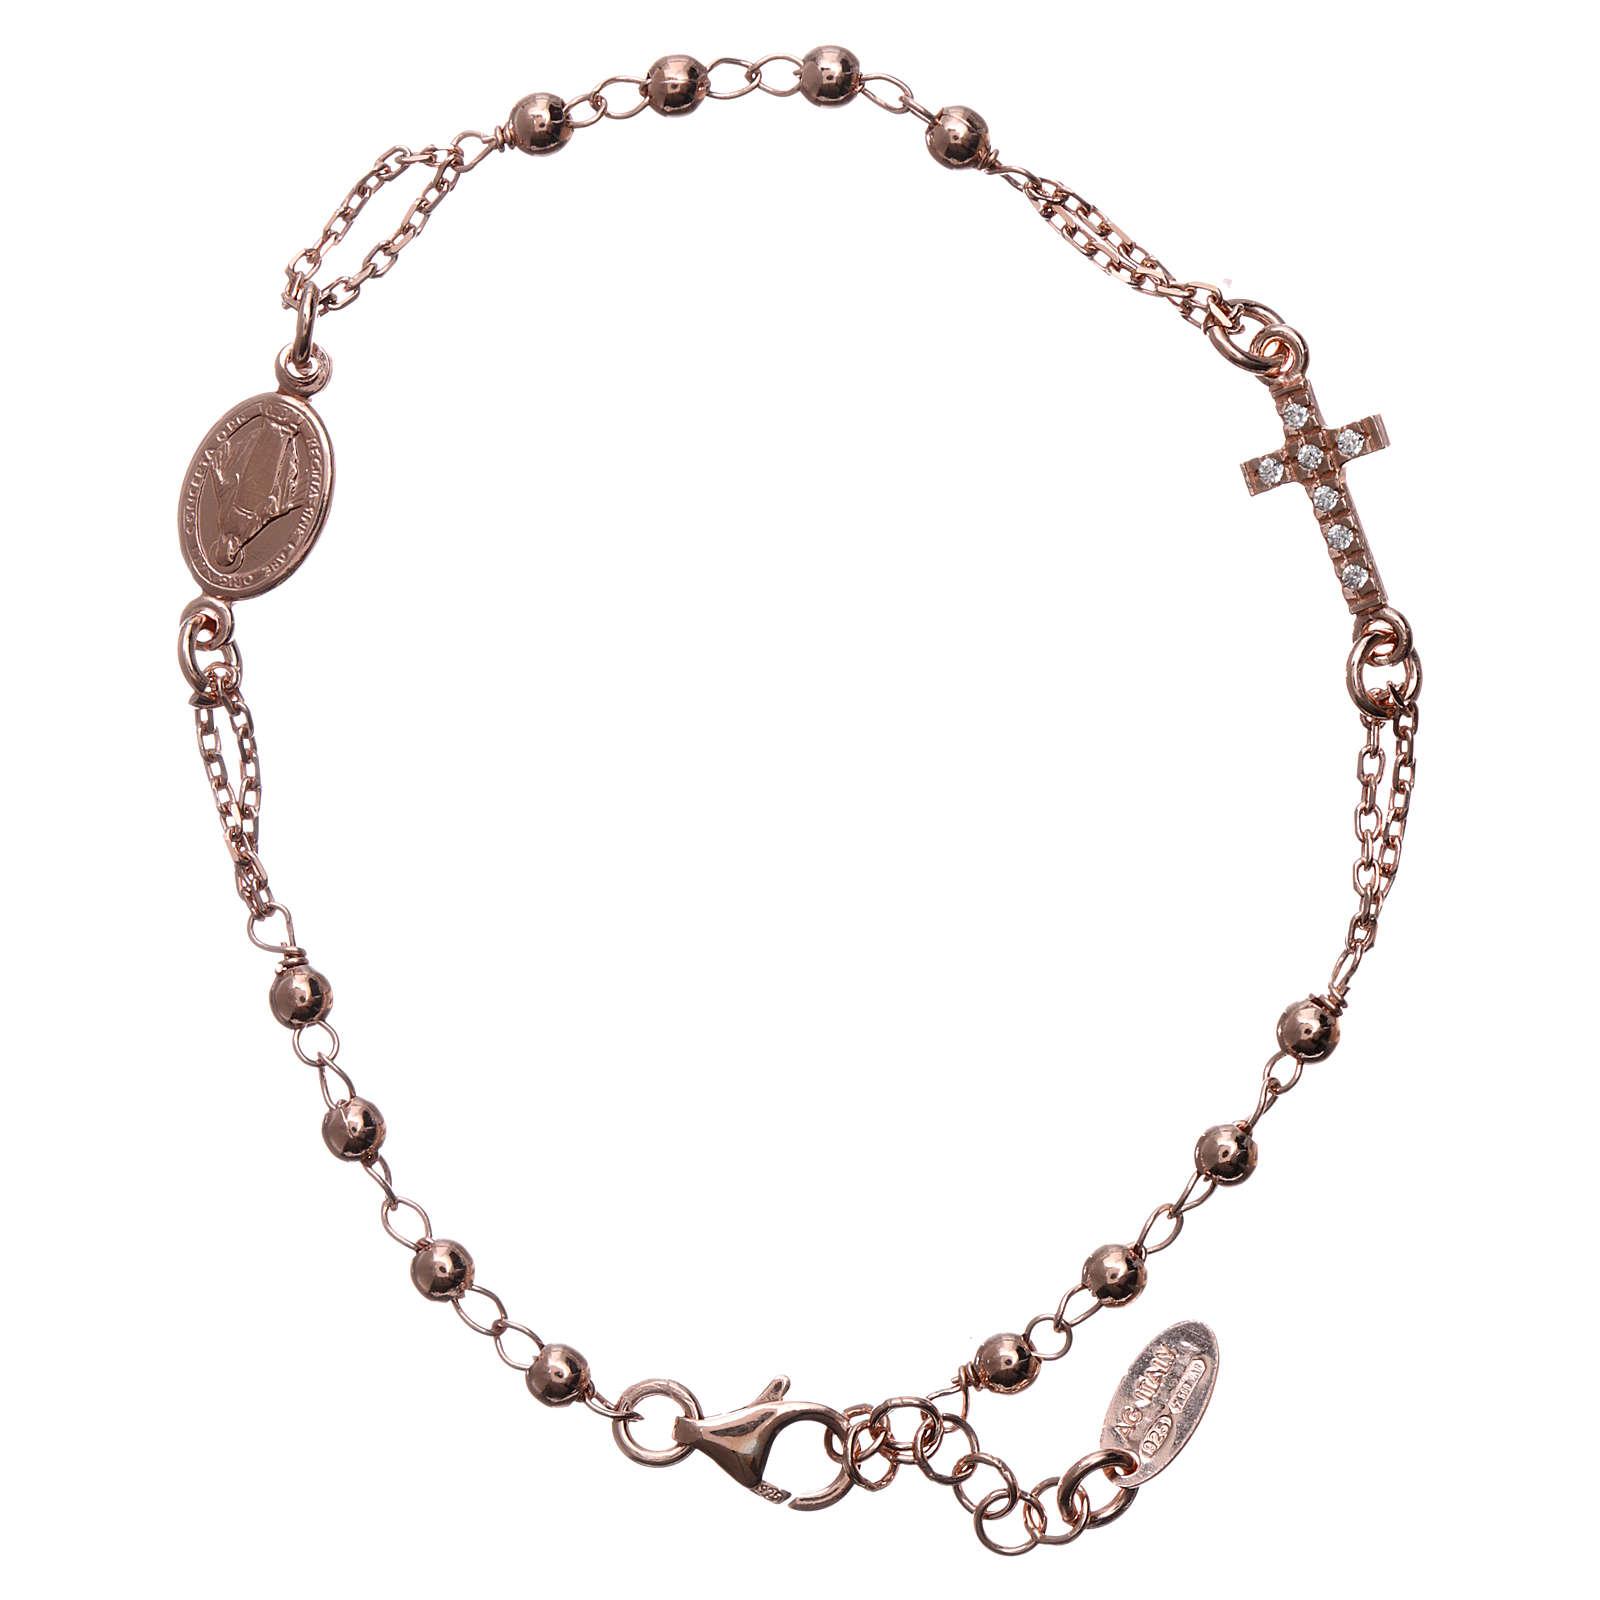 Rosary AMEN Bracelet Pavè Cross silver 925, Rosè finish 4